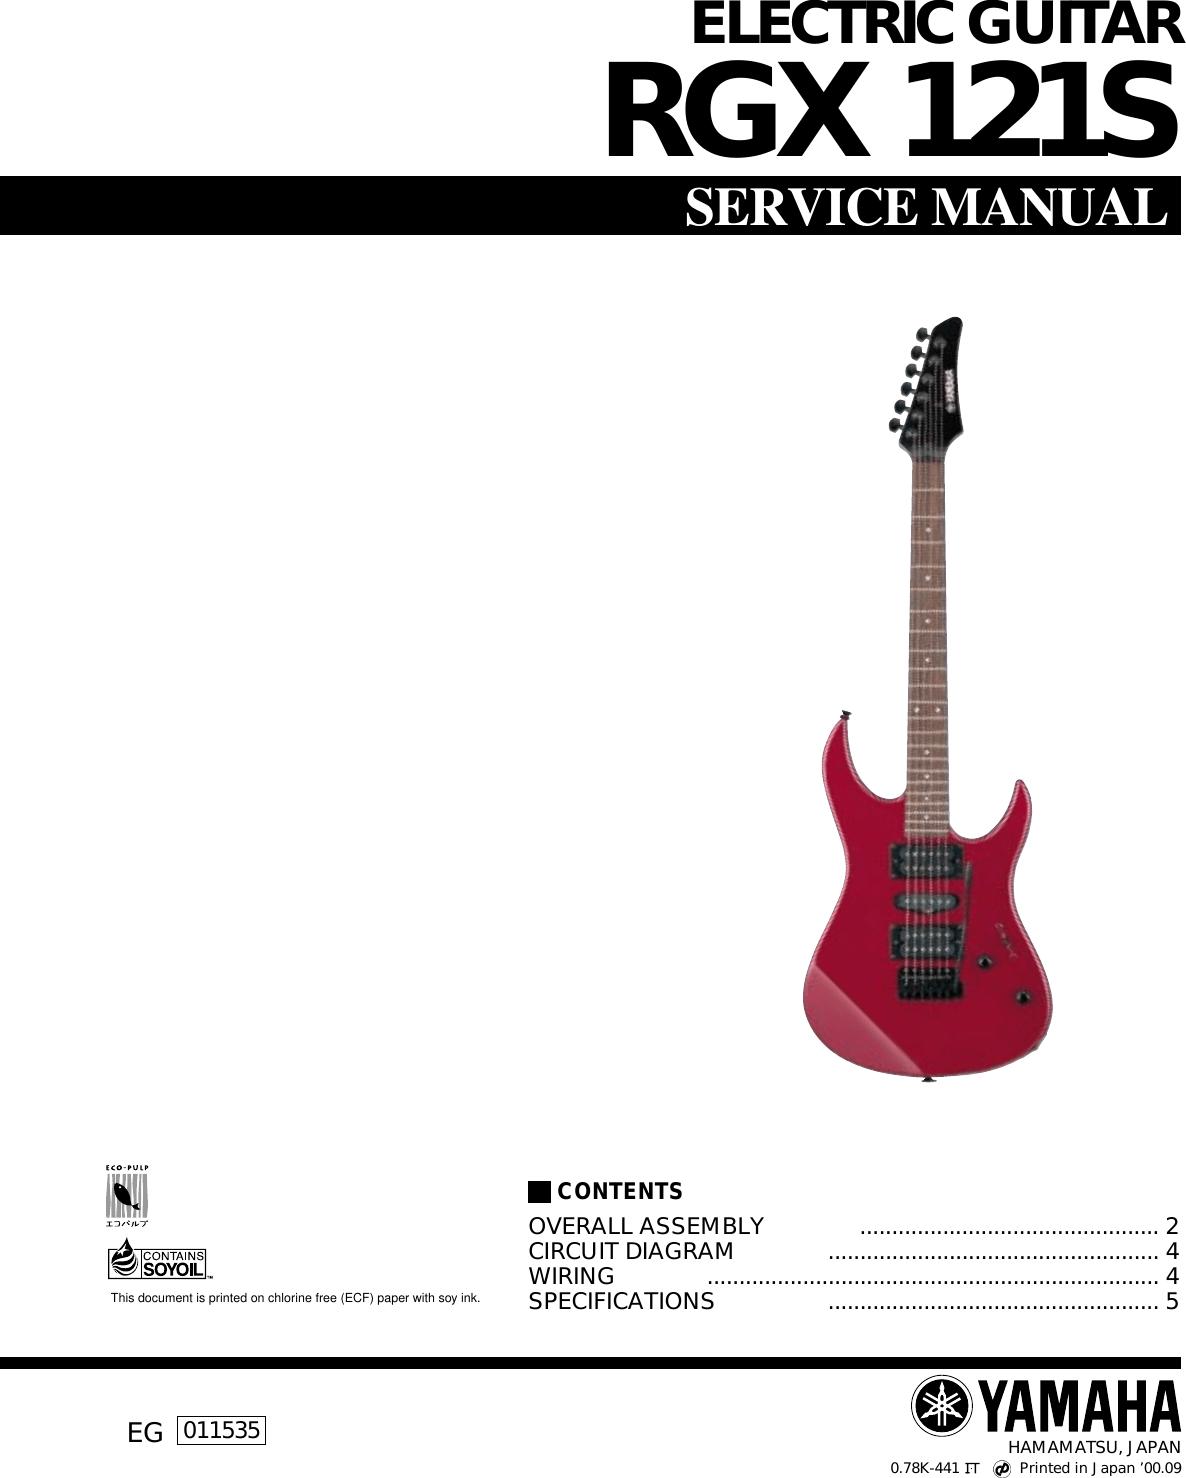 hight resolution of yamaha guitar electric users manual rgx 121s yamaha rgx 612j yamaha rgx wiring